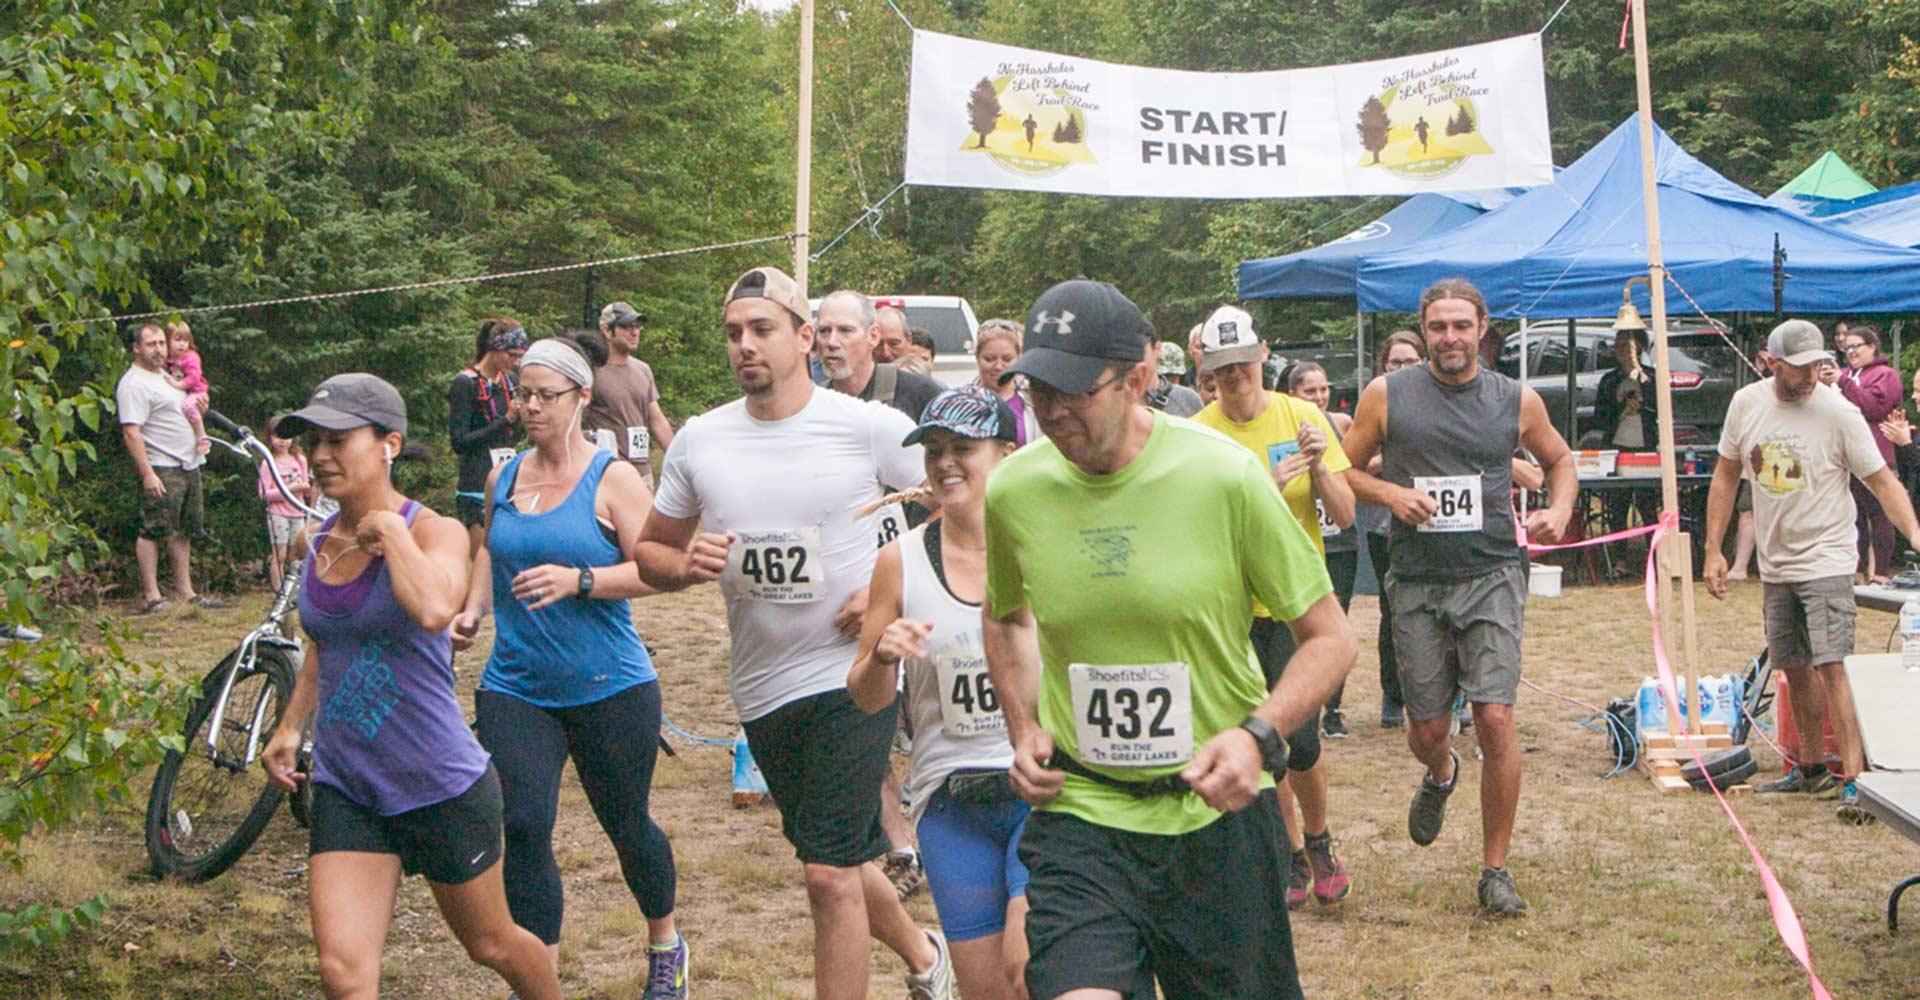 10km-start-race